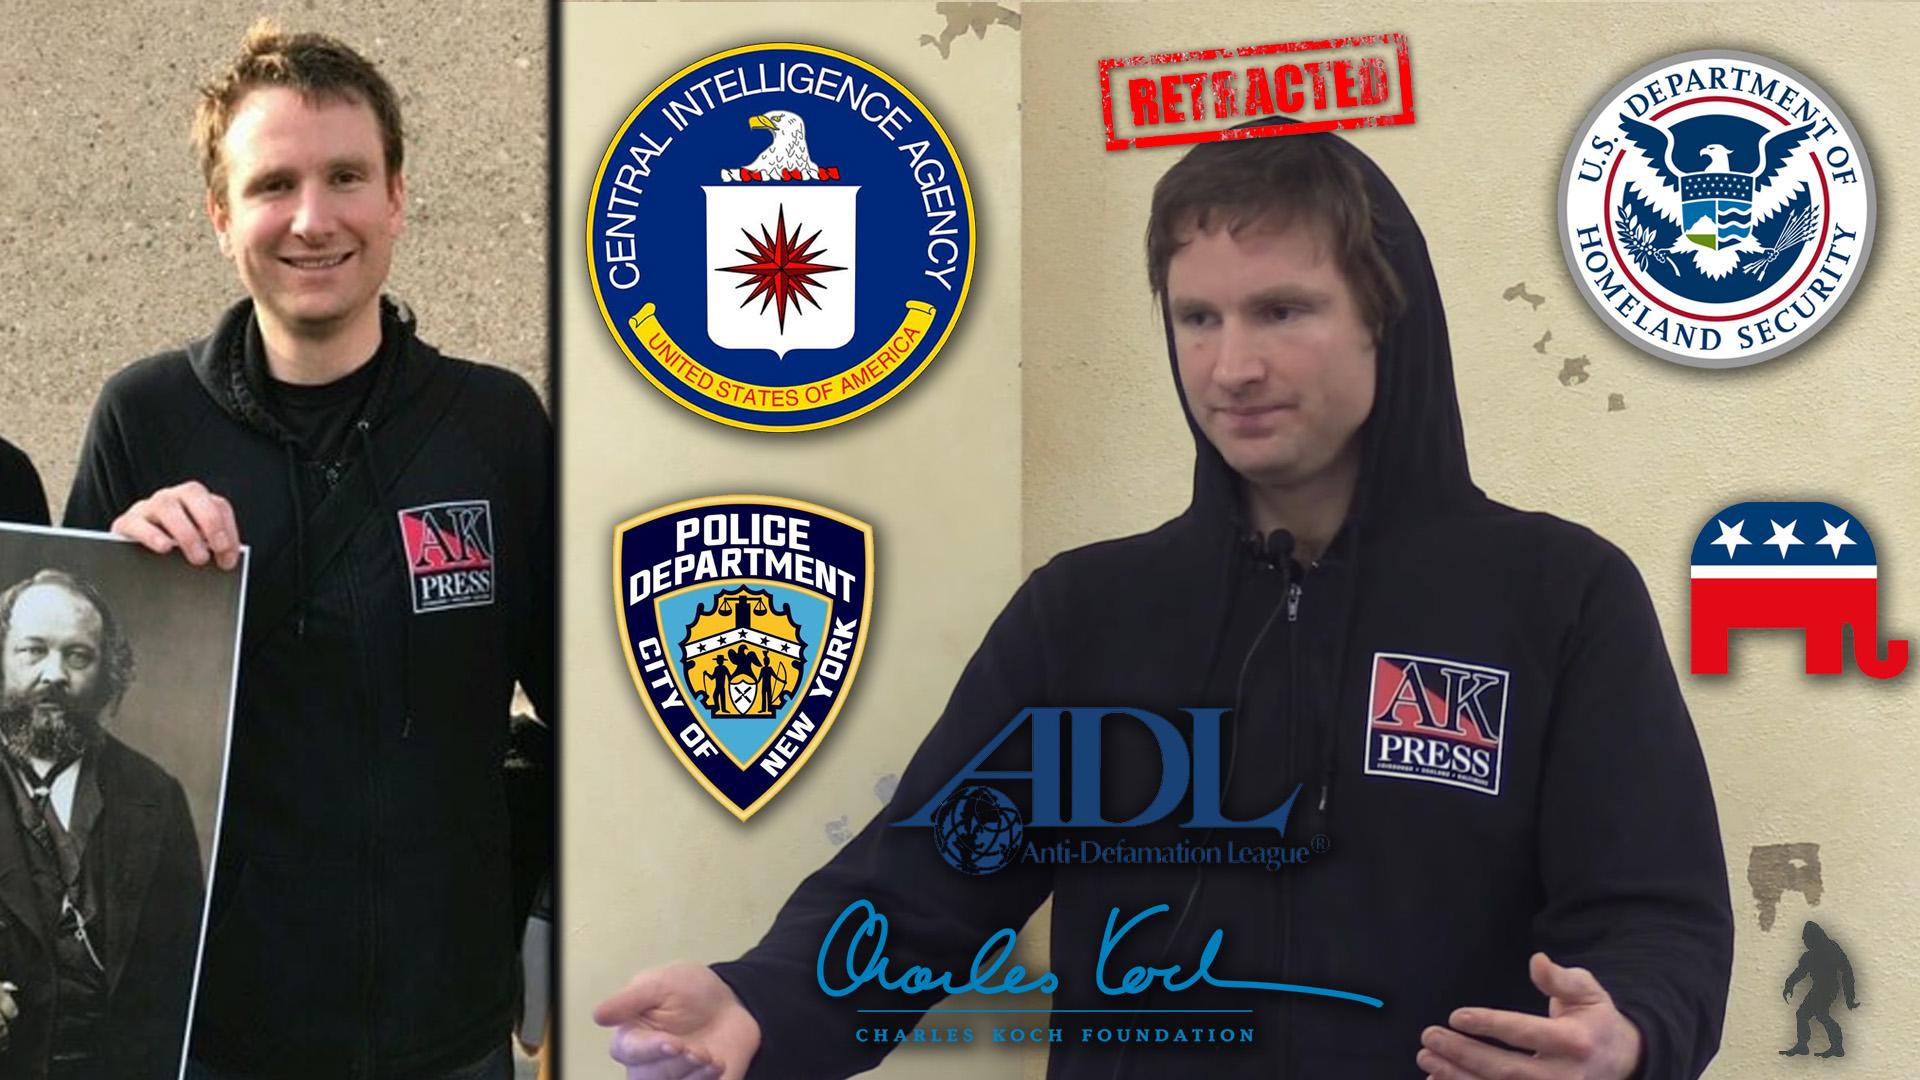 anarchist-Alexander-Reid-Ross-CIA-DHS-po